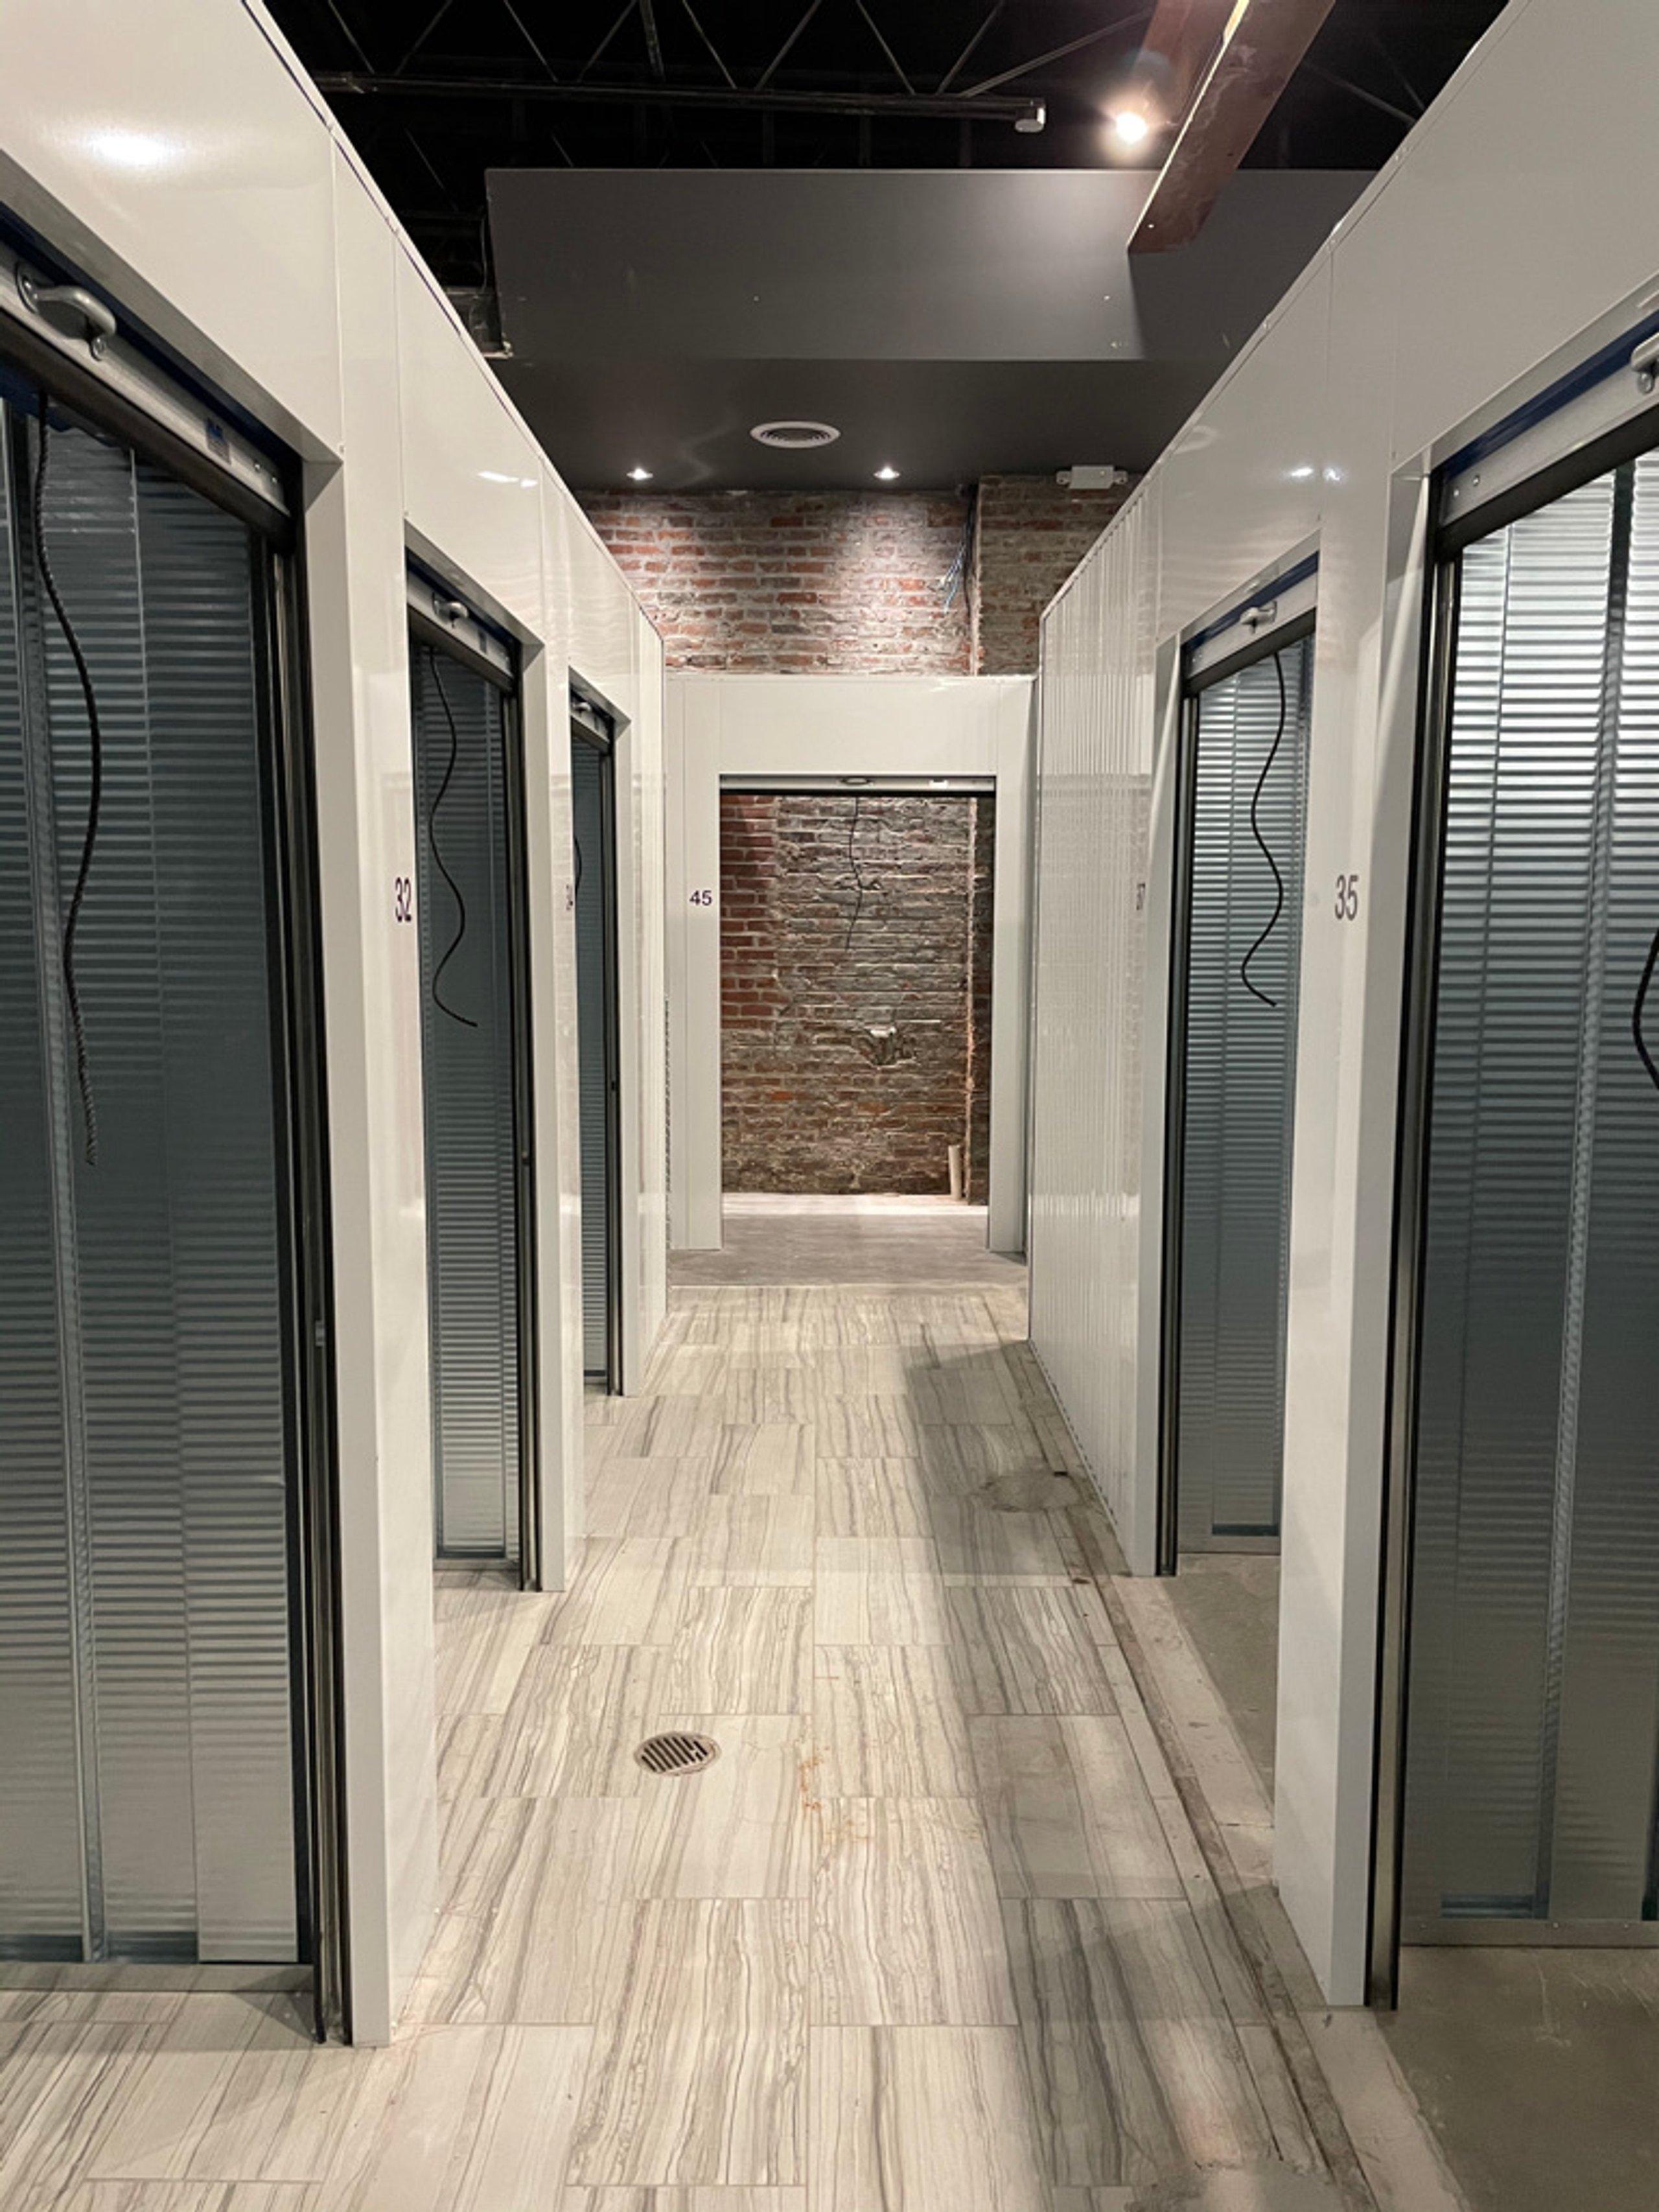 6x4 Self Storage Unit self storage unit